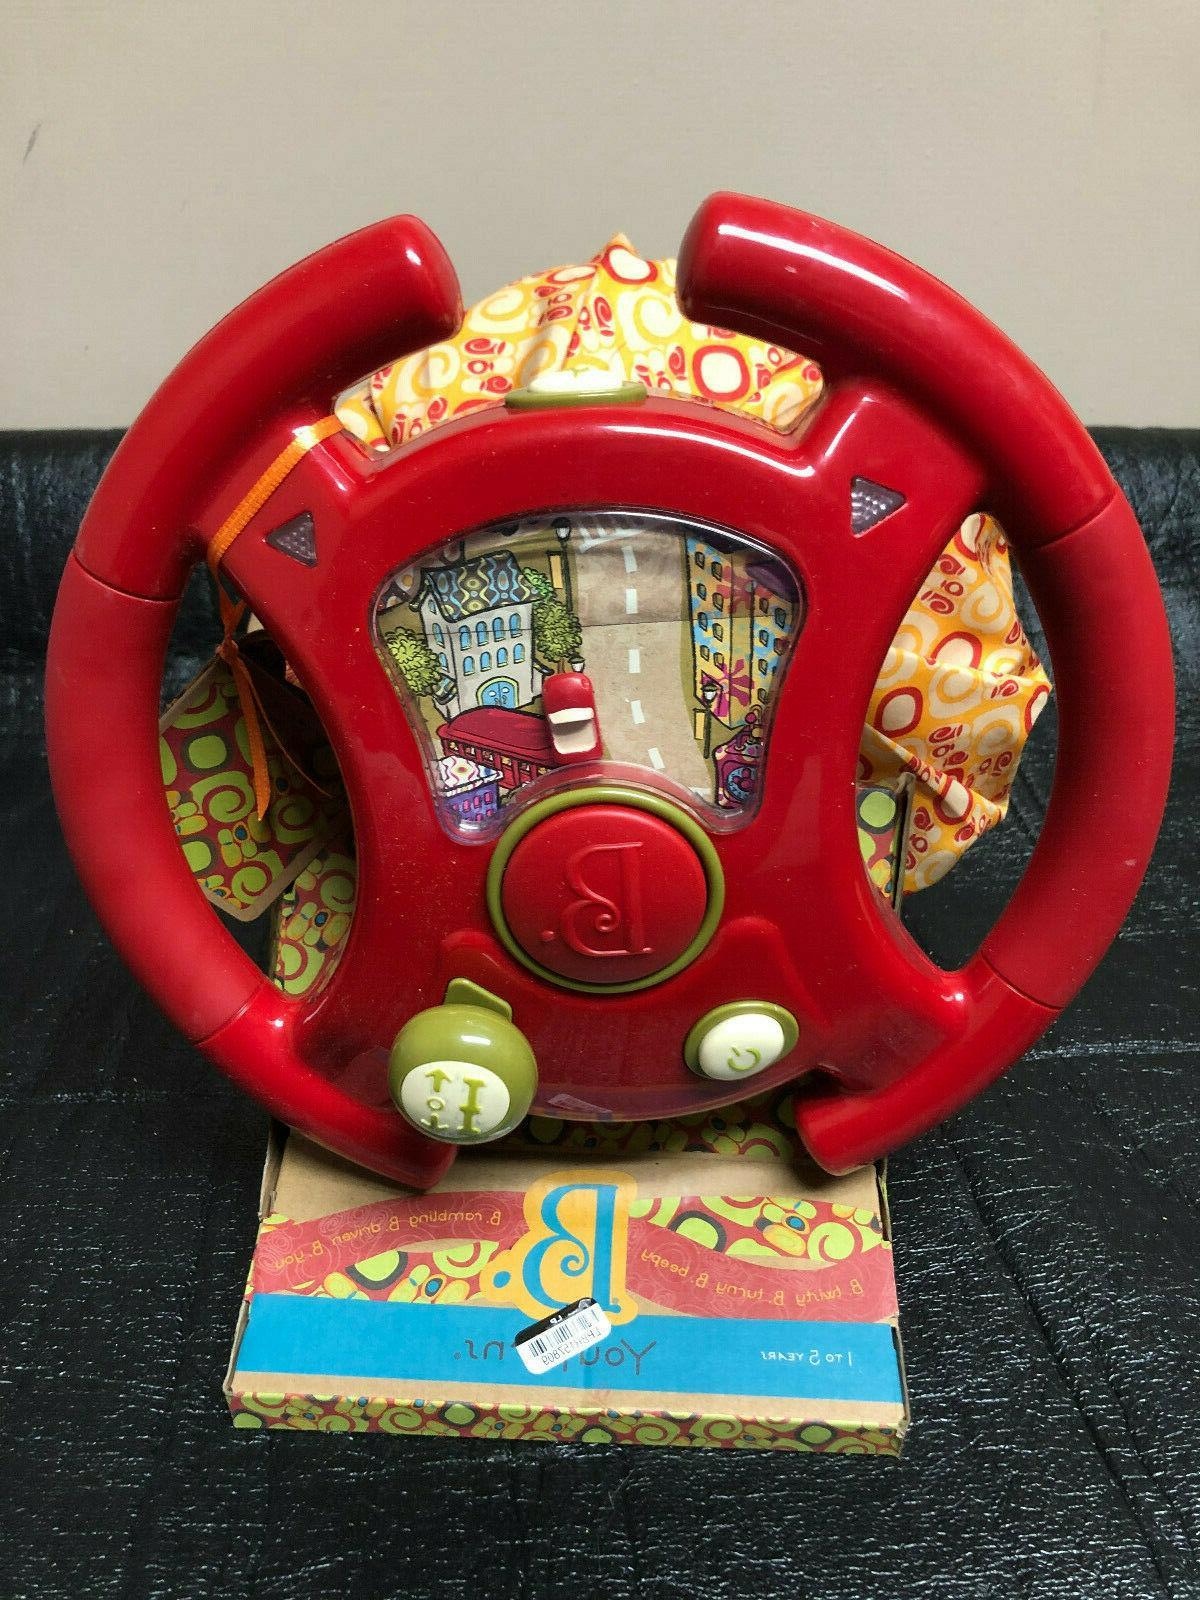 b toys youturns steering wheel led lights